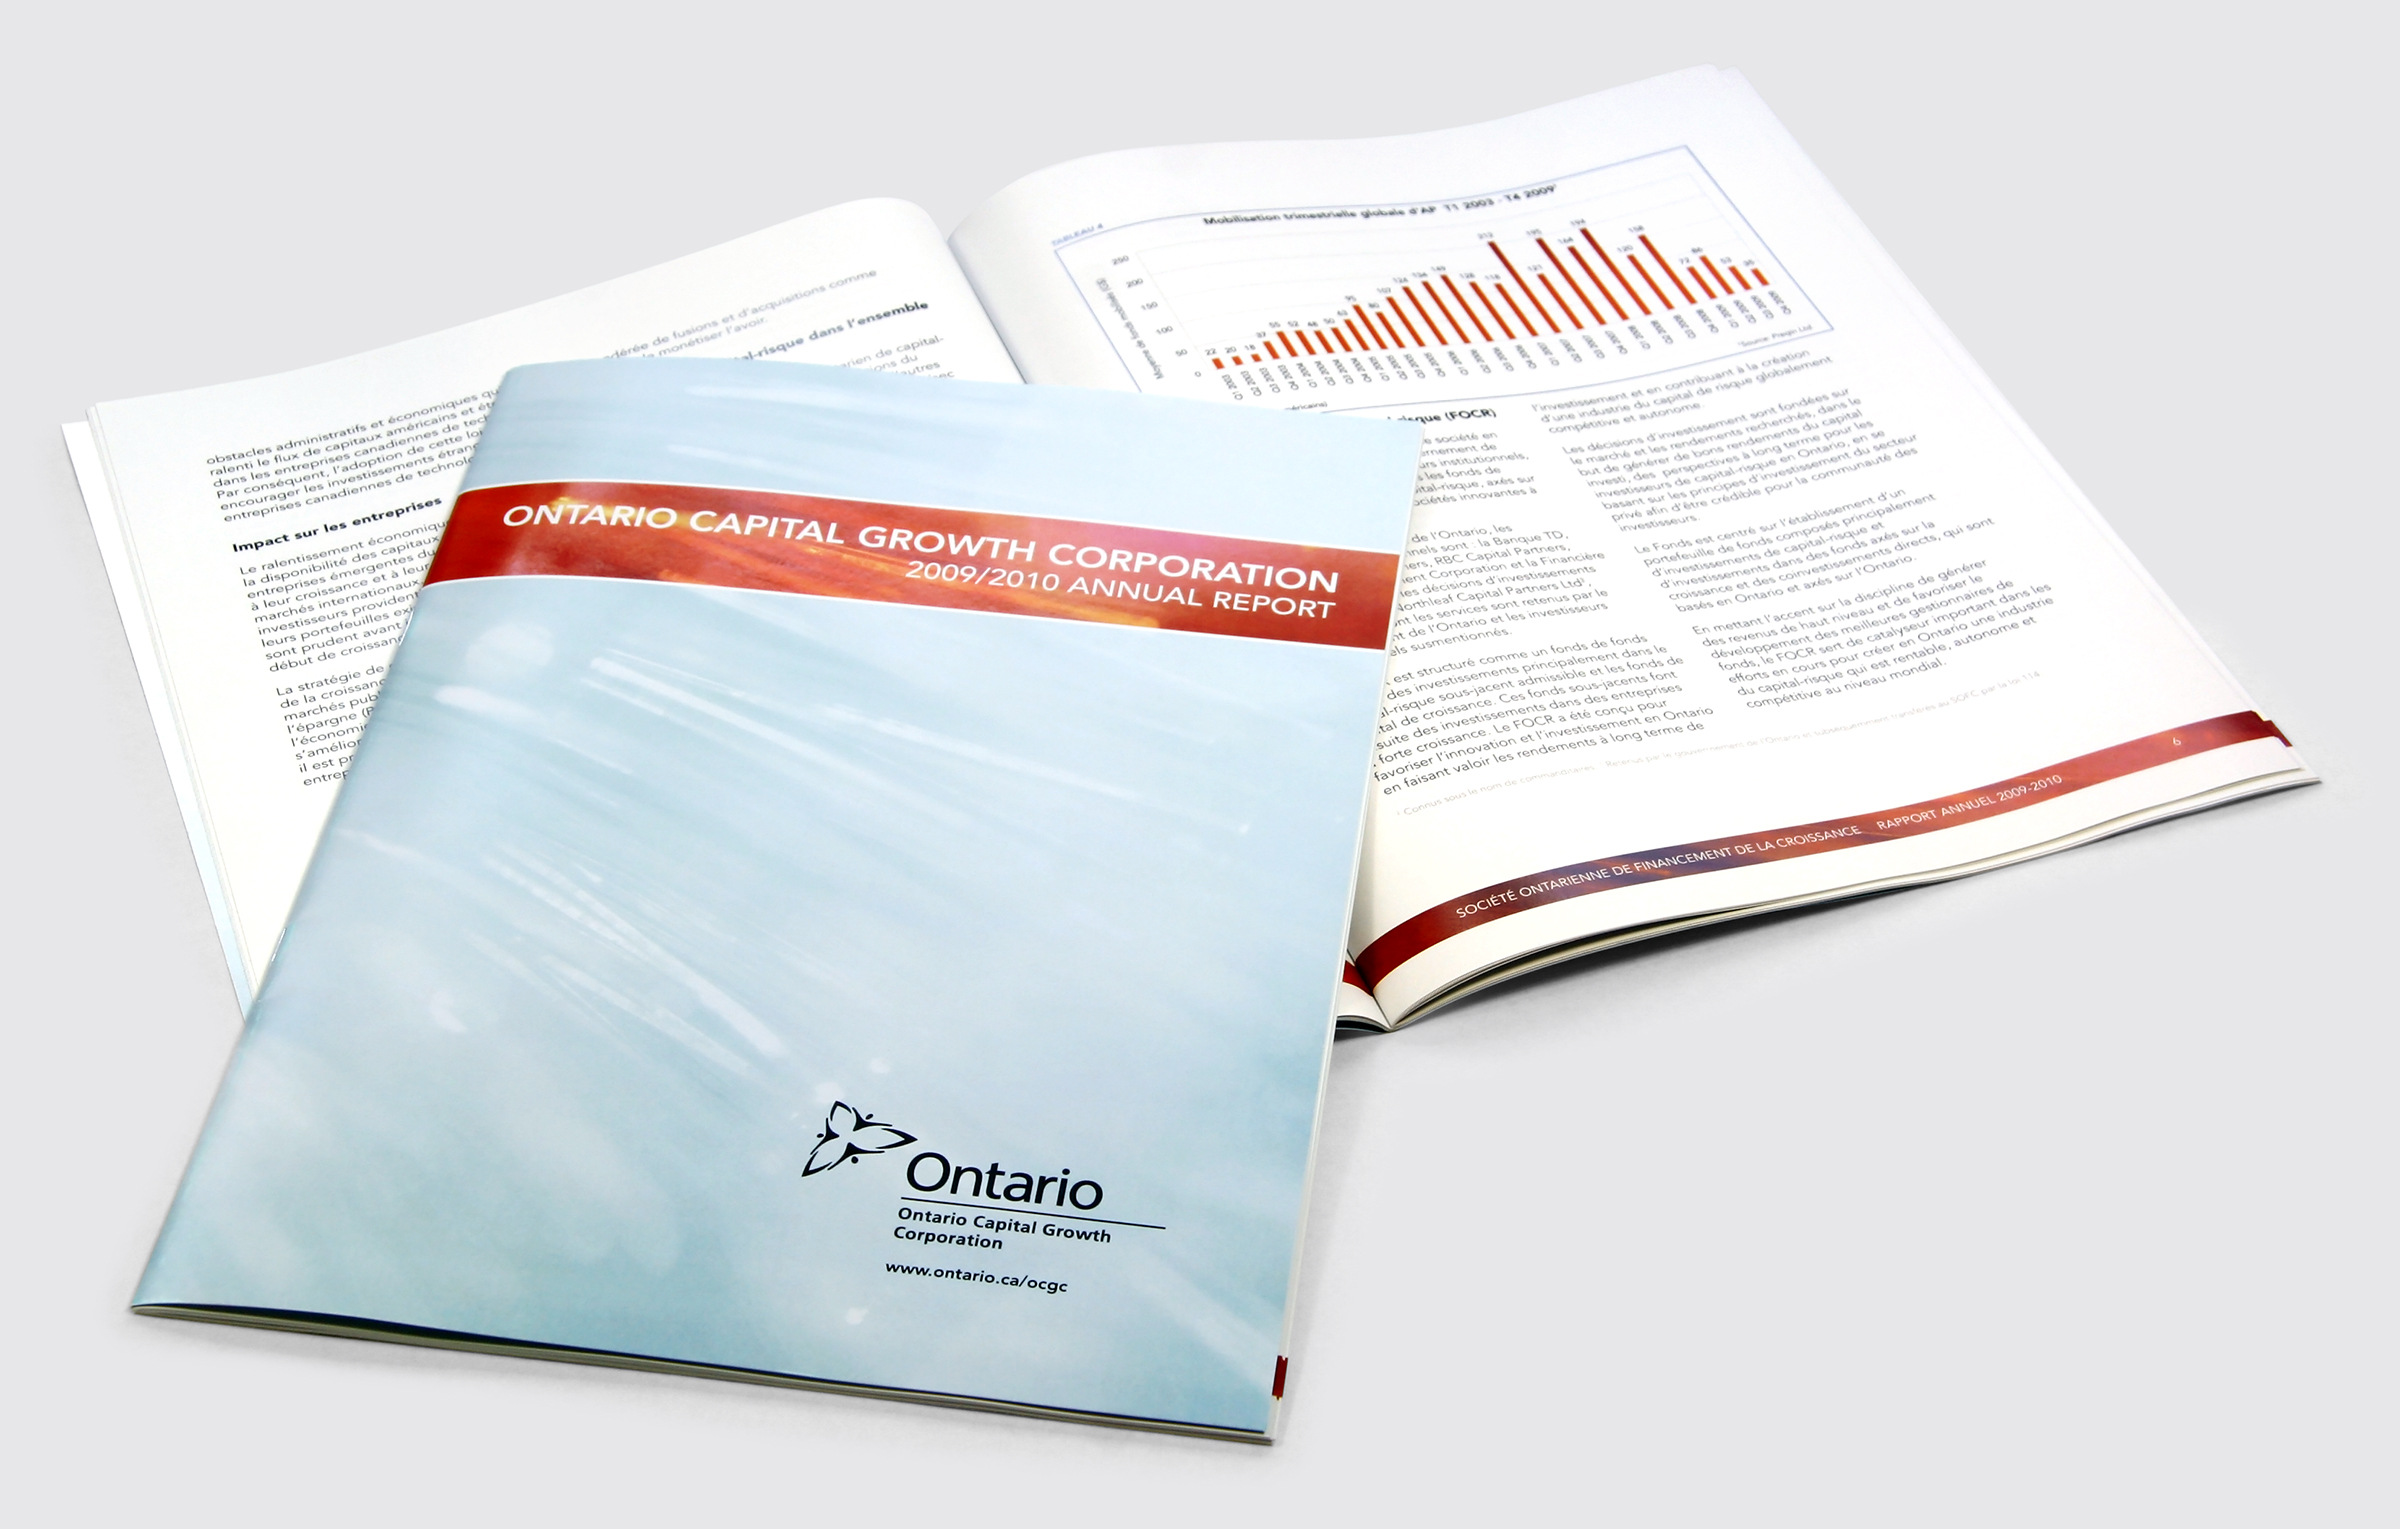 2009/2010 Annual Report